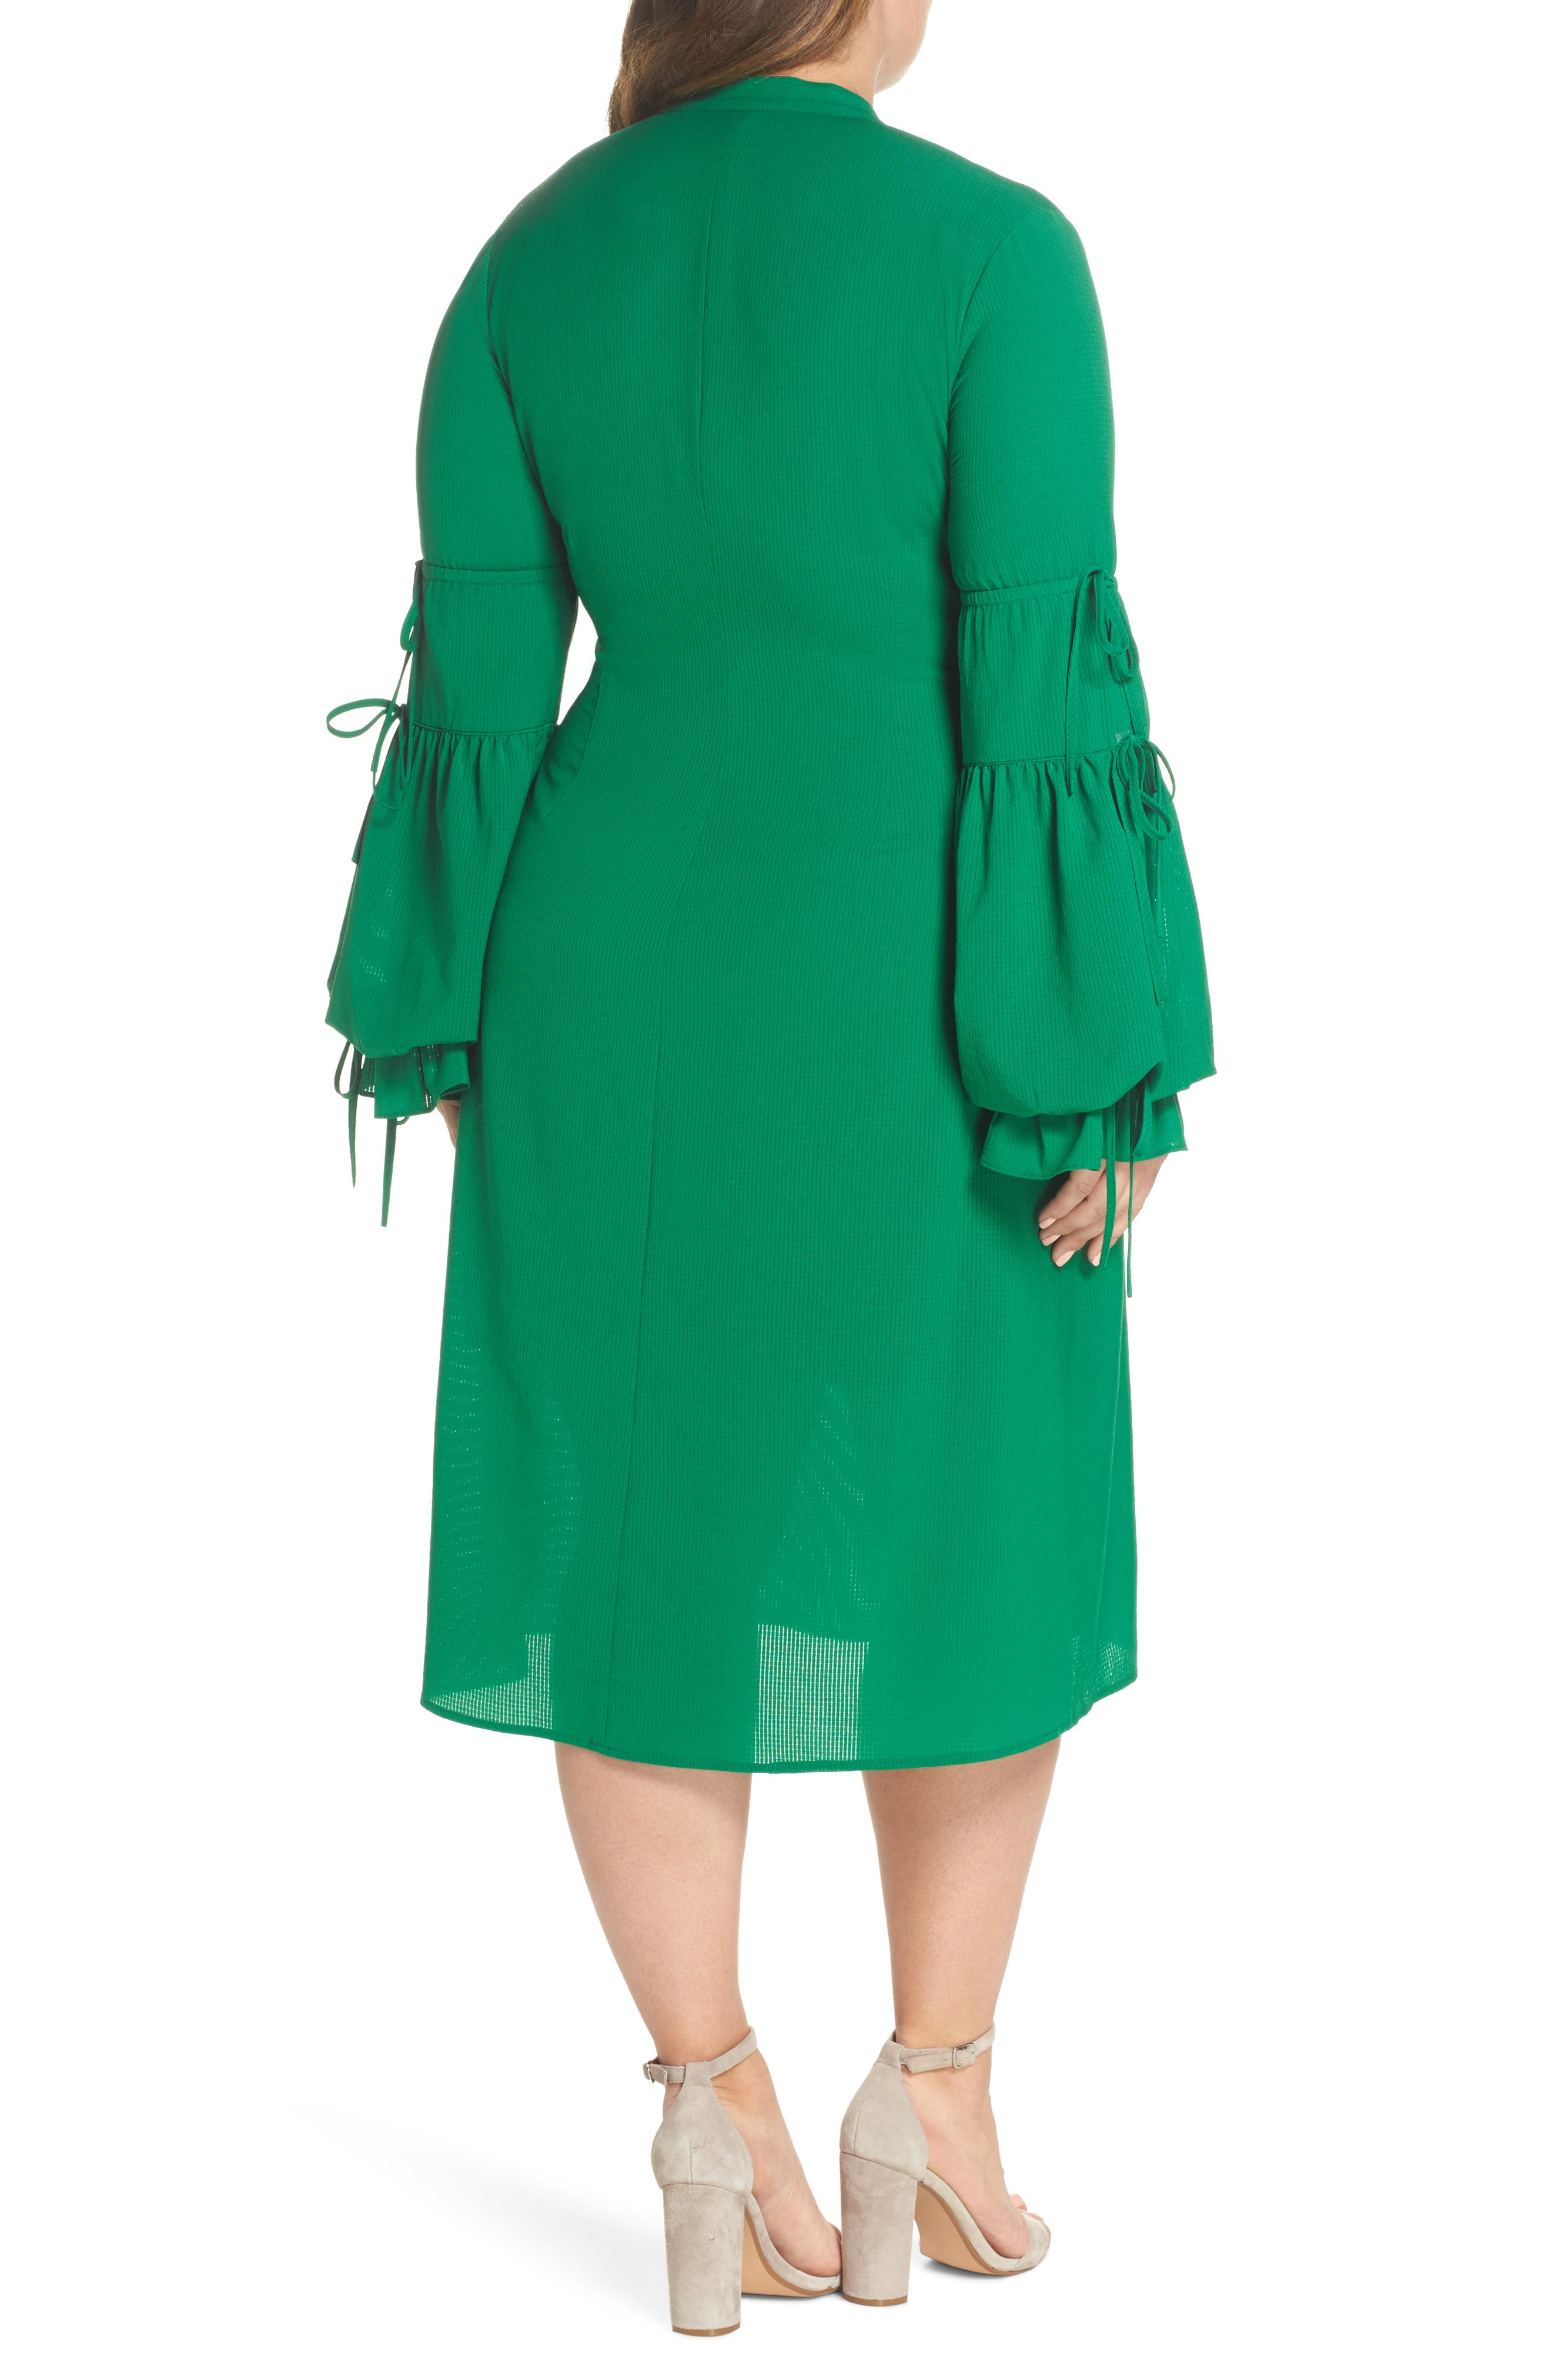 Leiko Antoinette Puff Sleeve Tea Dress,                             Alternate thumbnail 2, color,                             300